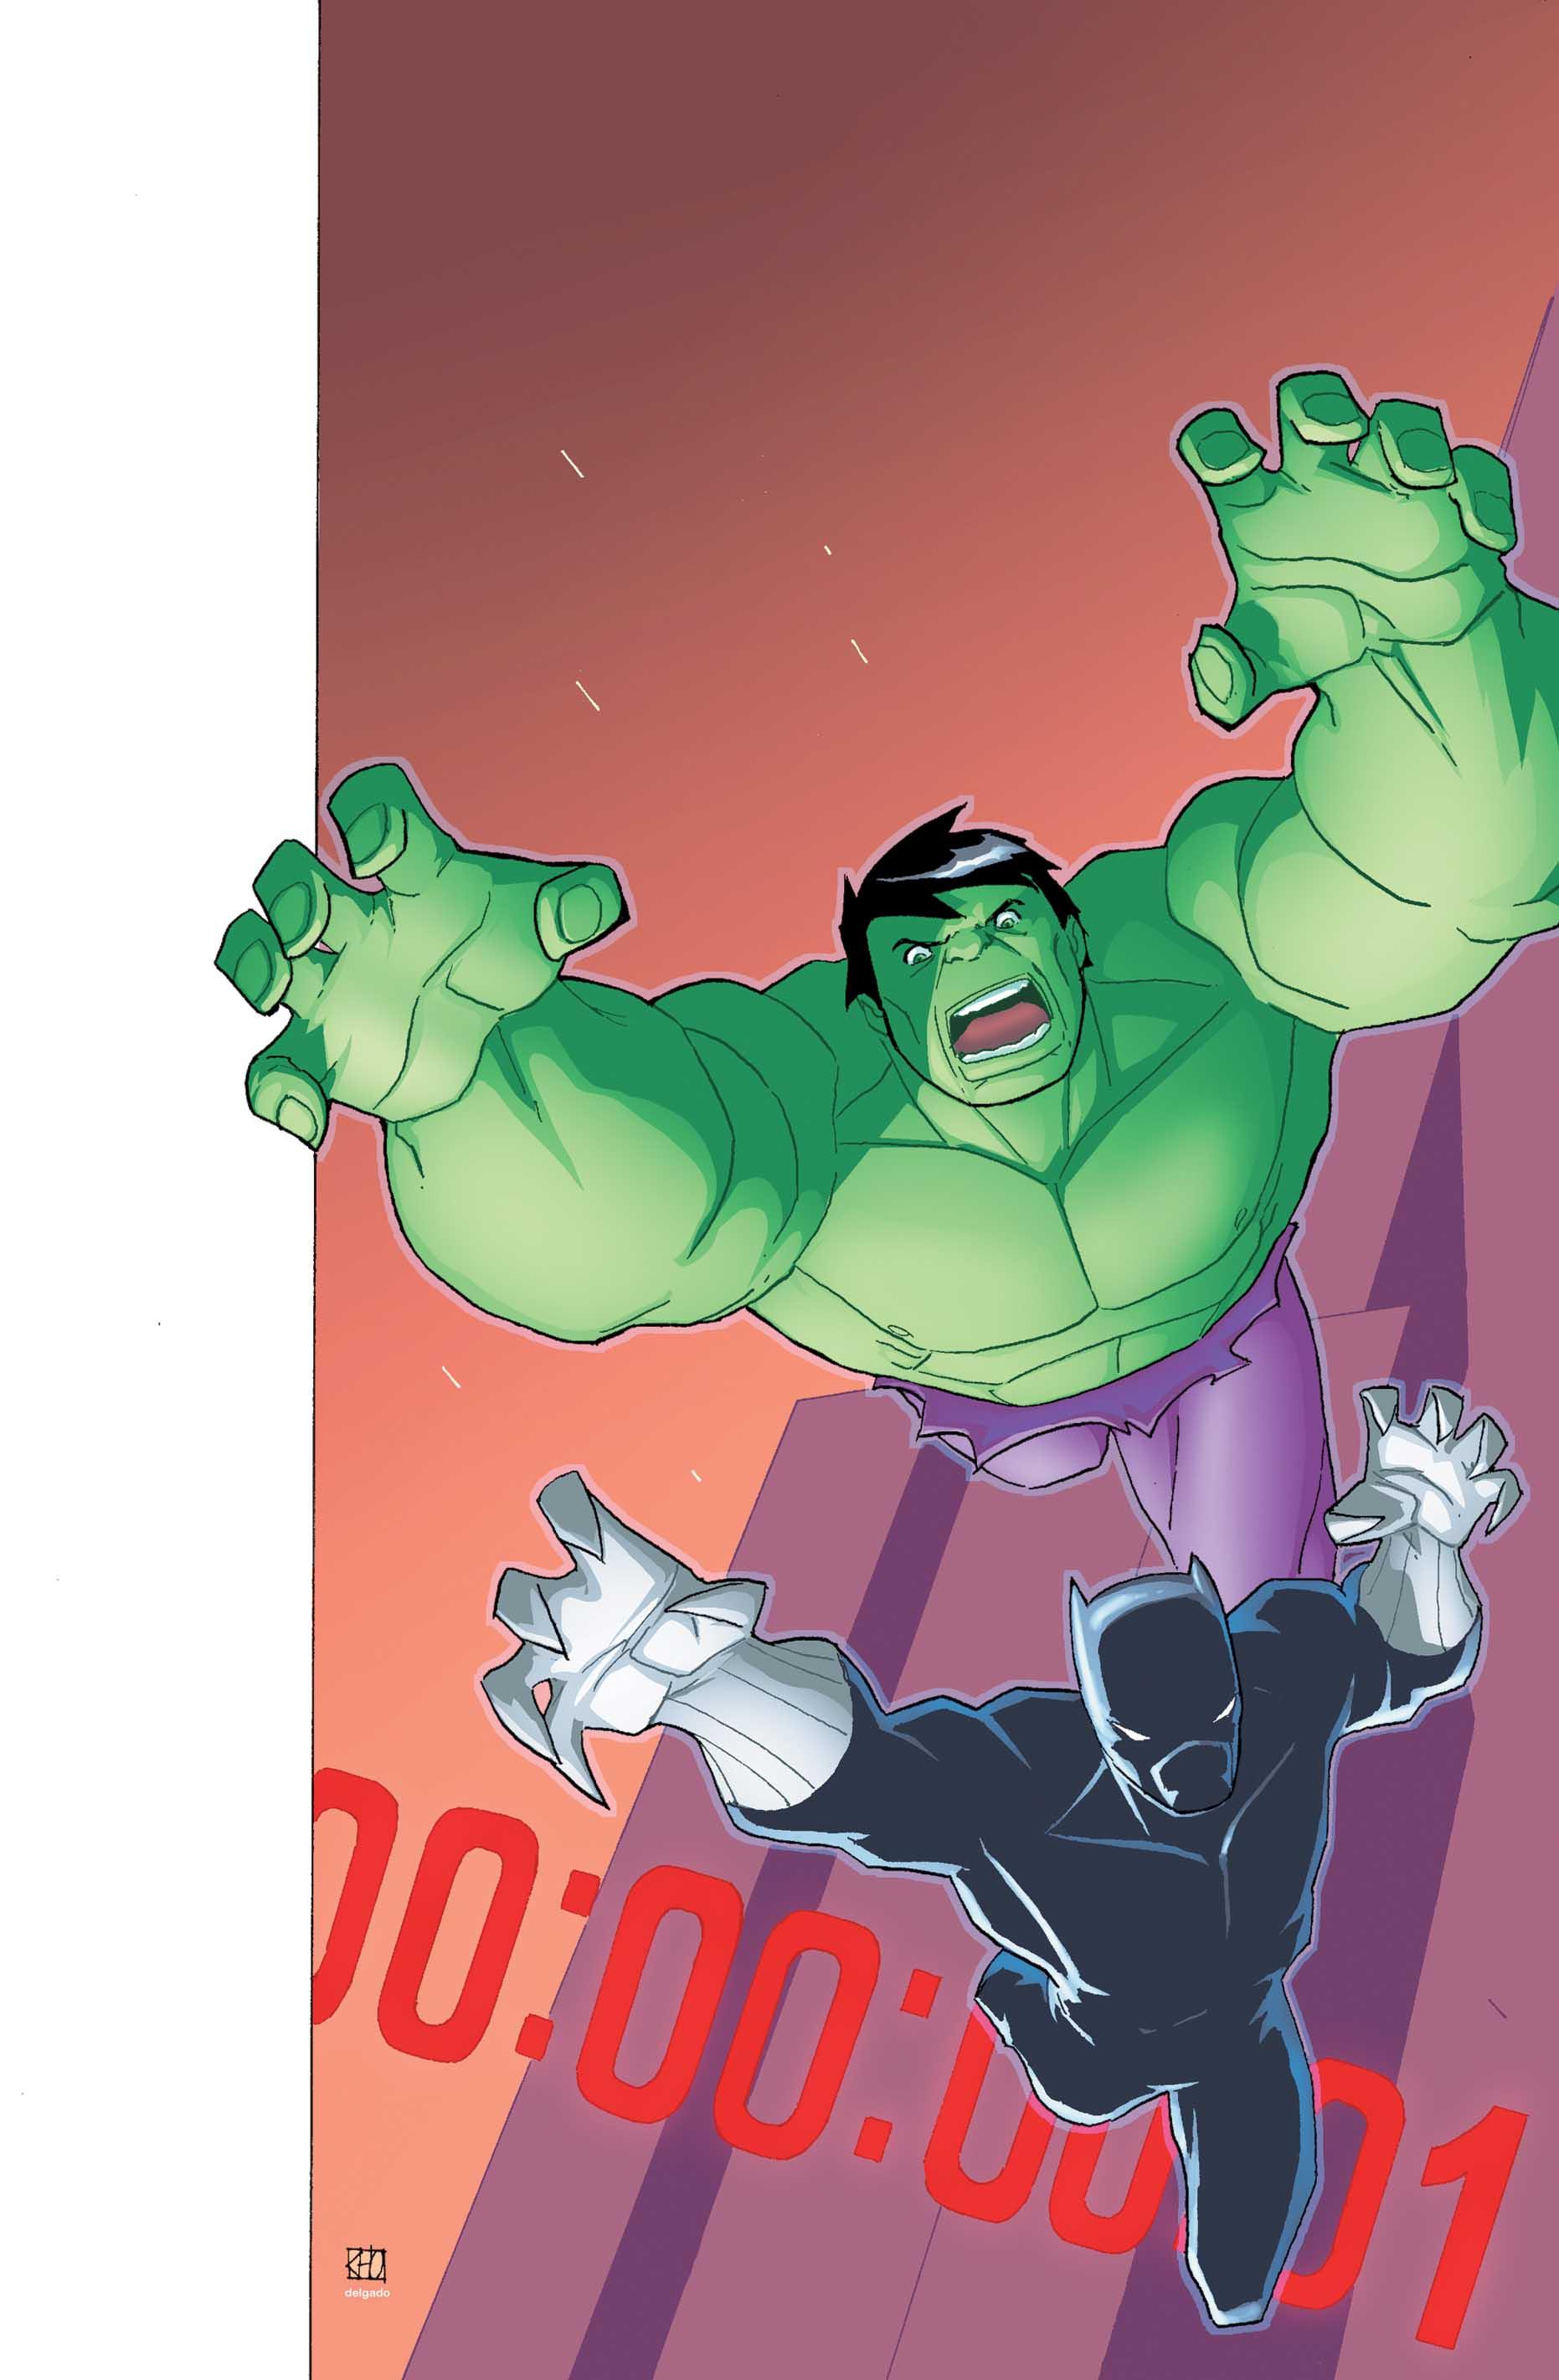 Marvel Universe Avengers: Earth's Mightiest Heroes (2012) #8